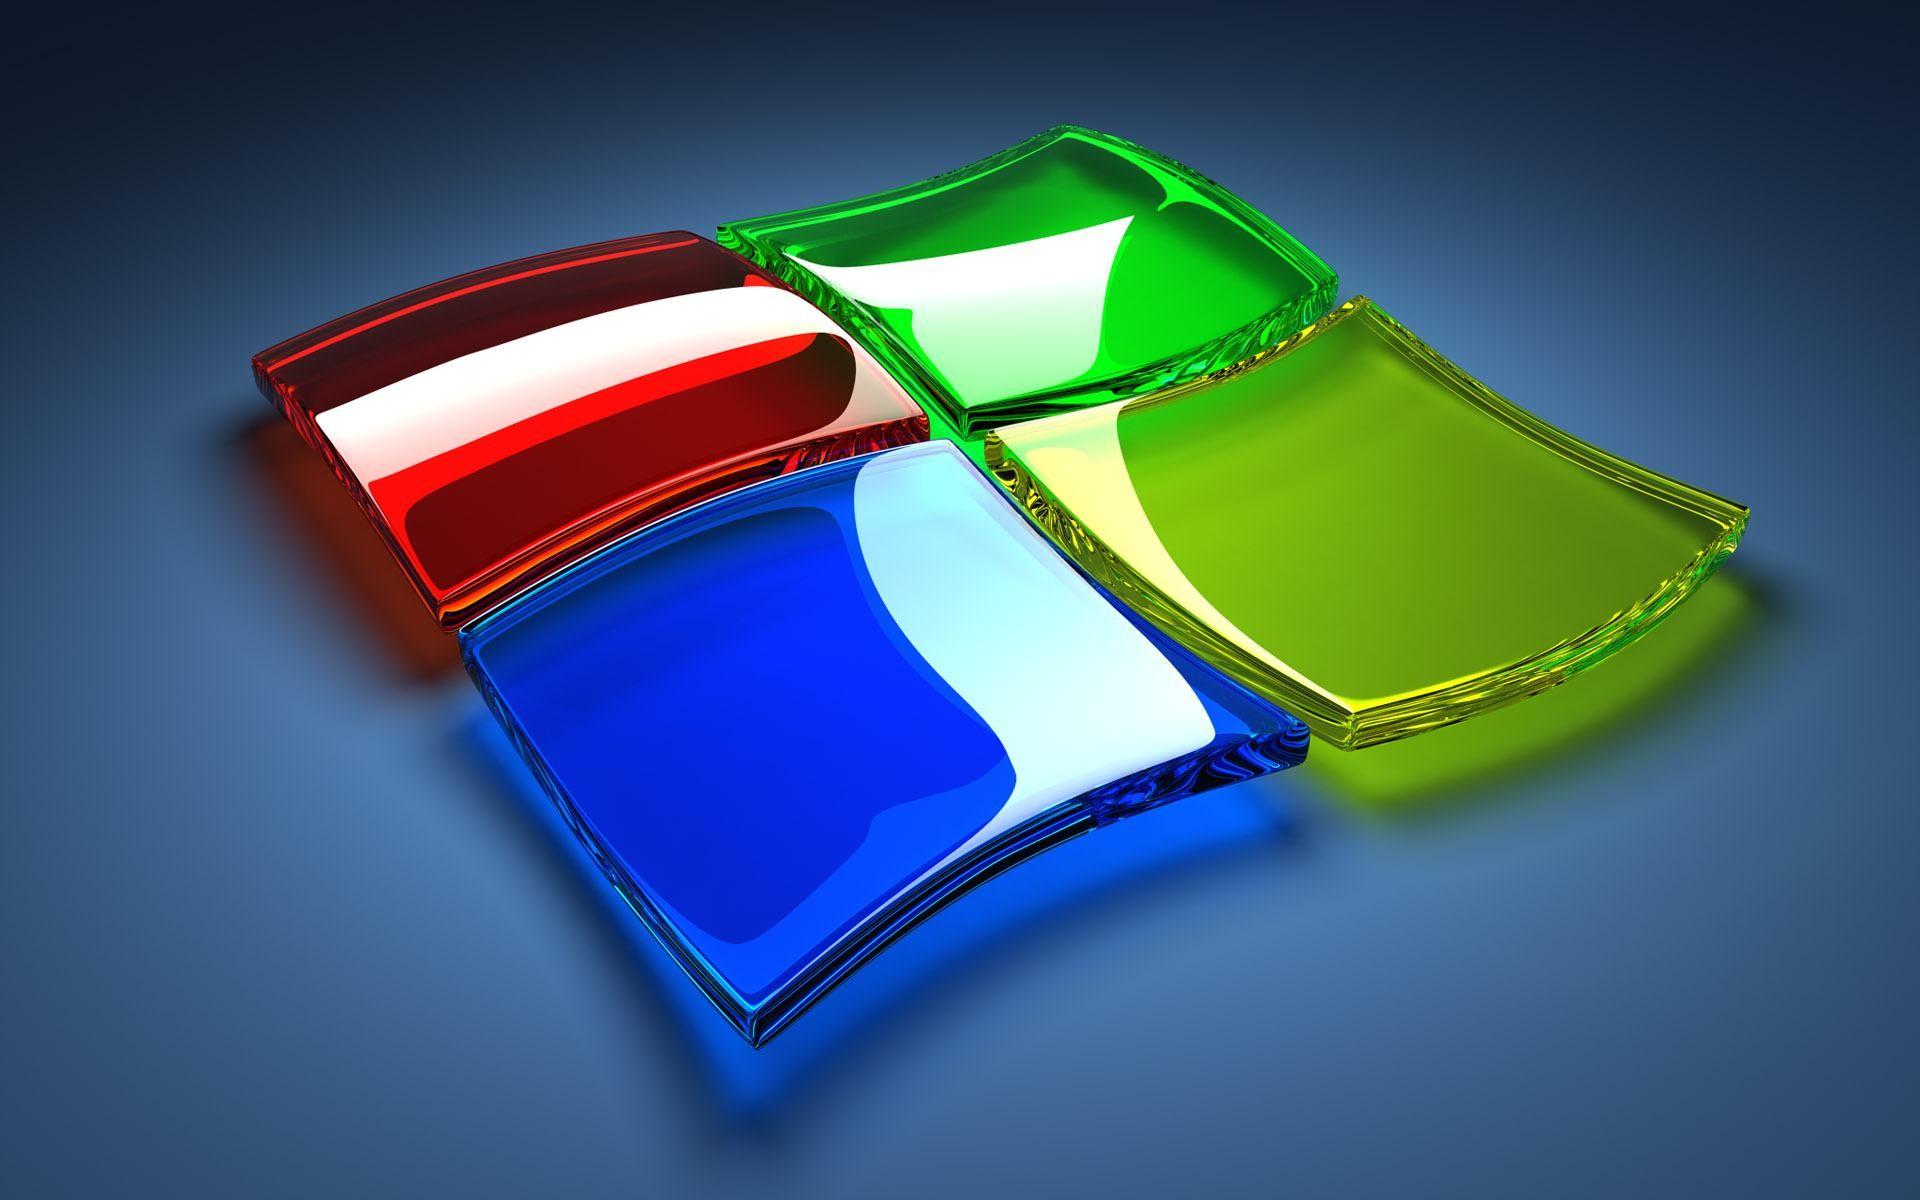 3d animated desktop wallpaper for windows xp visit chile